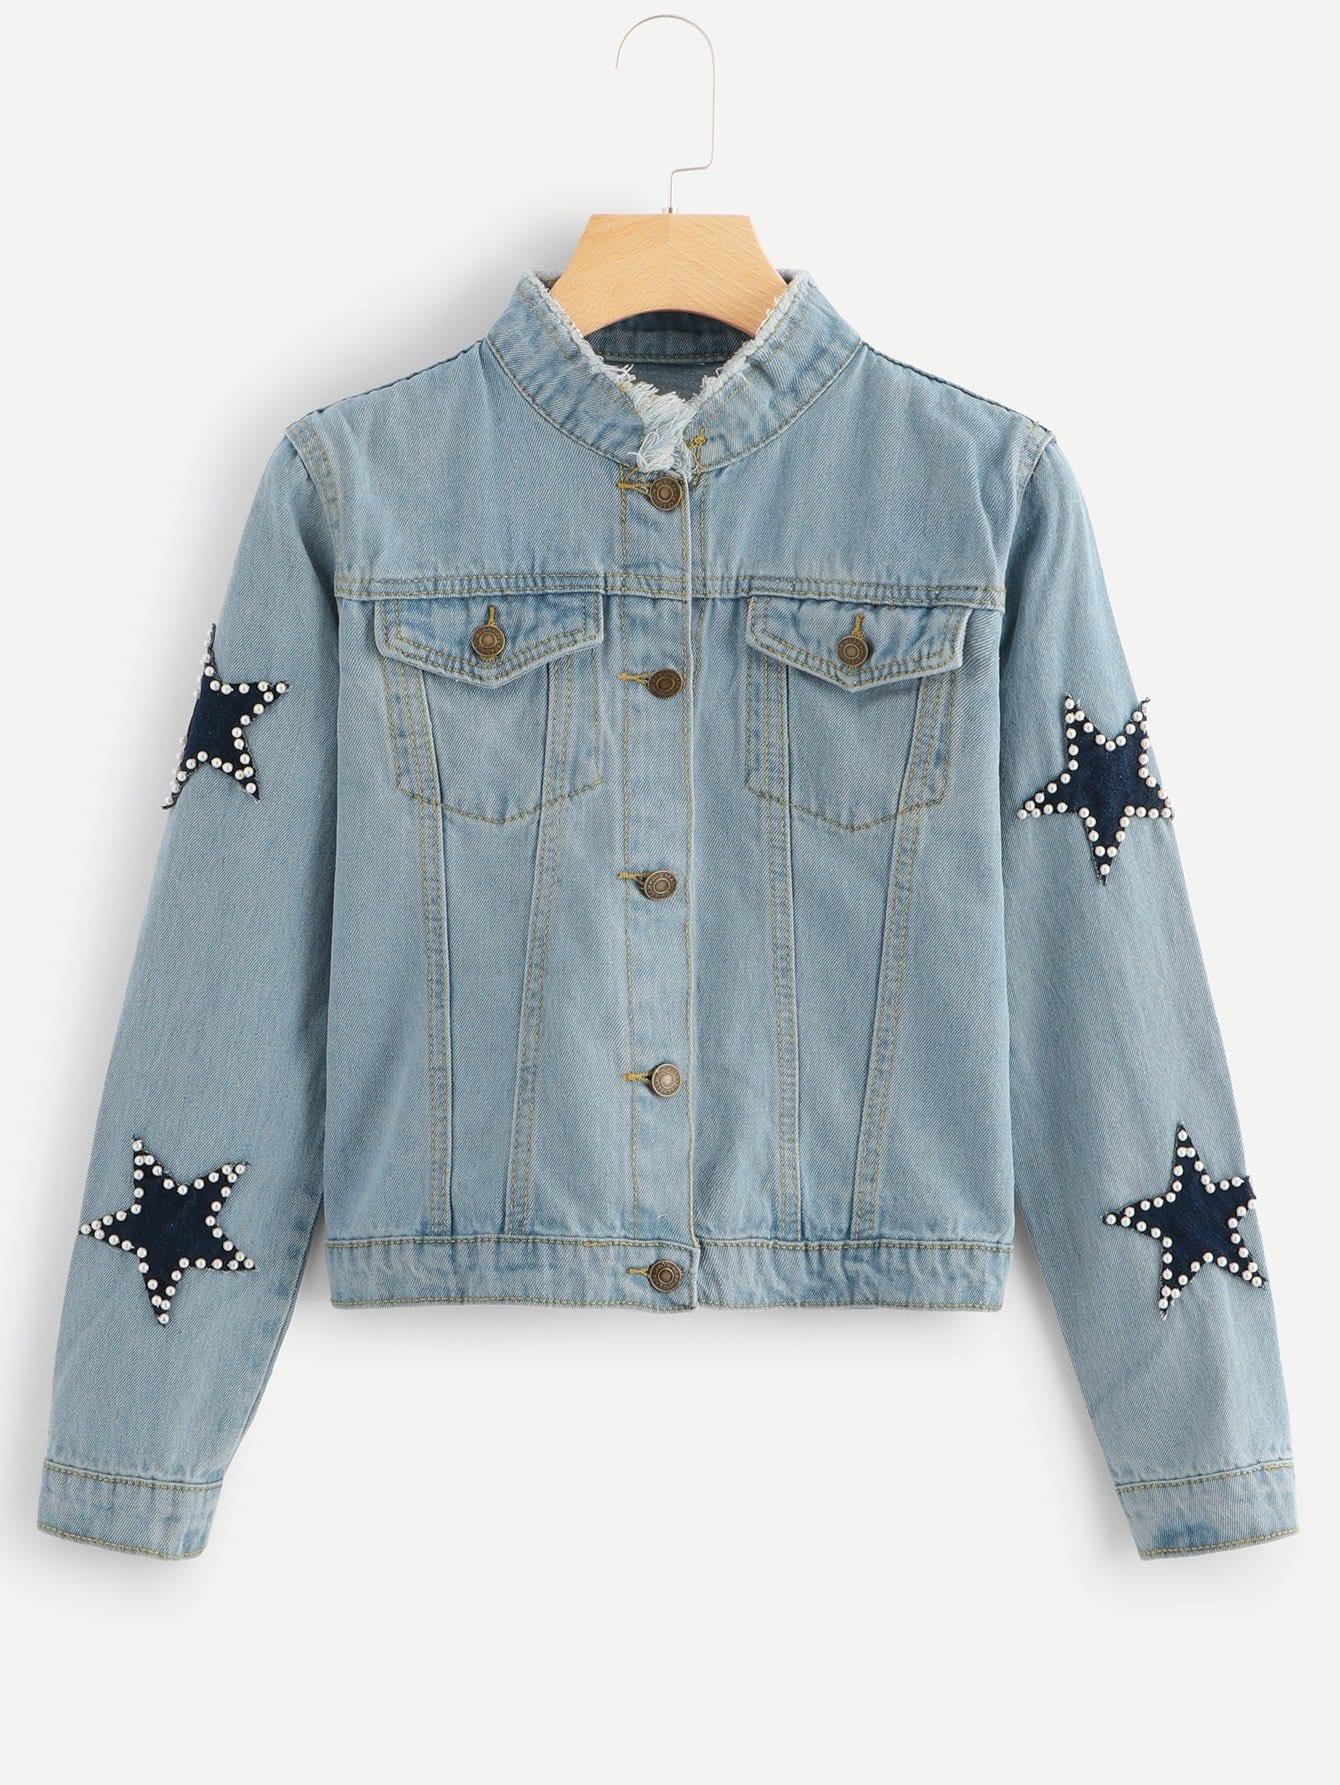 Beaded Detail Pocket Decoration Denim Jacket